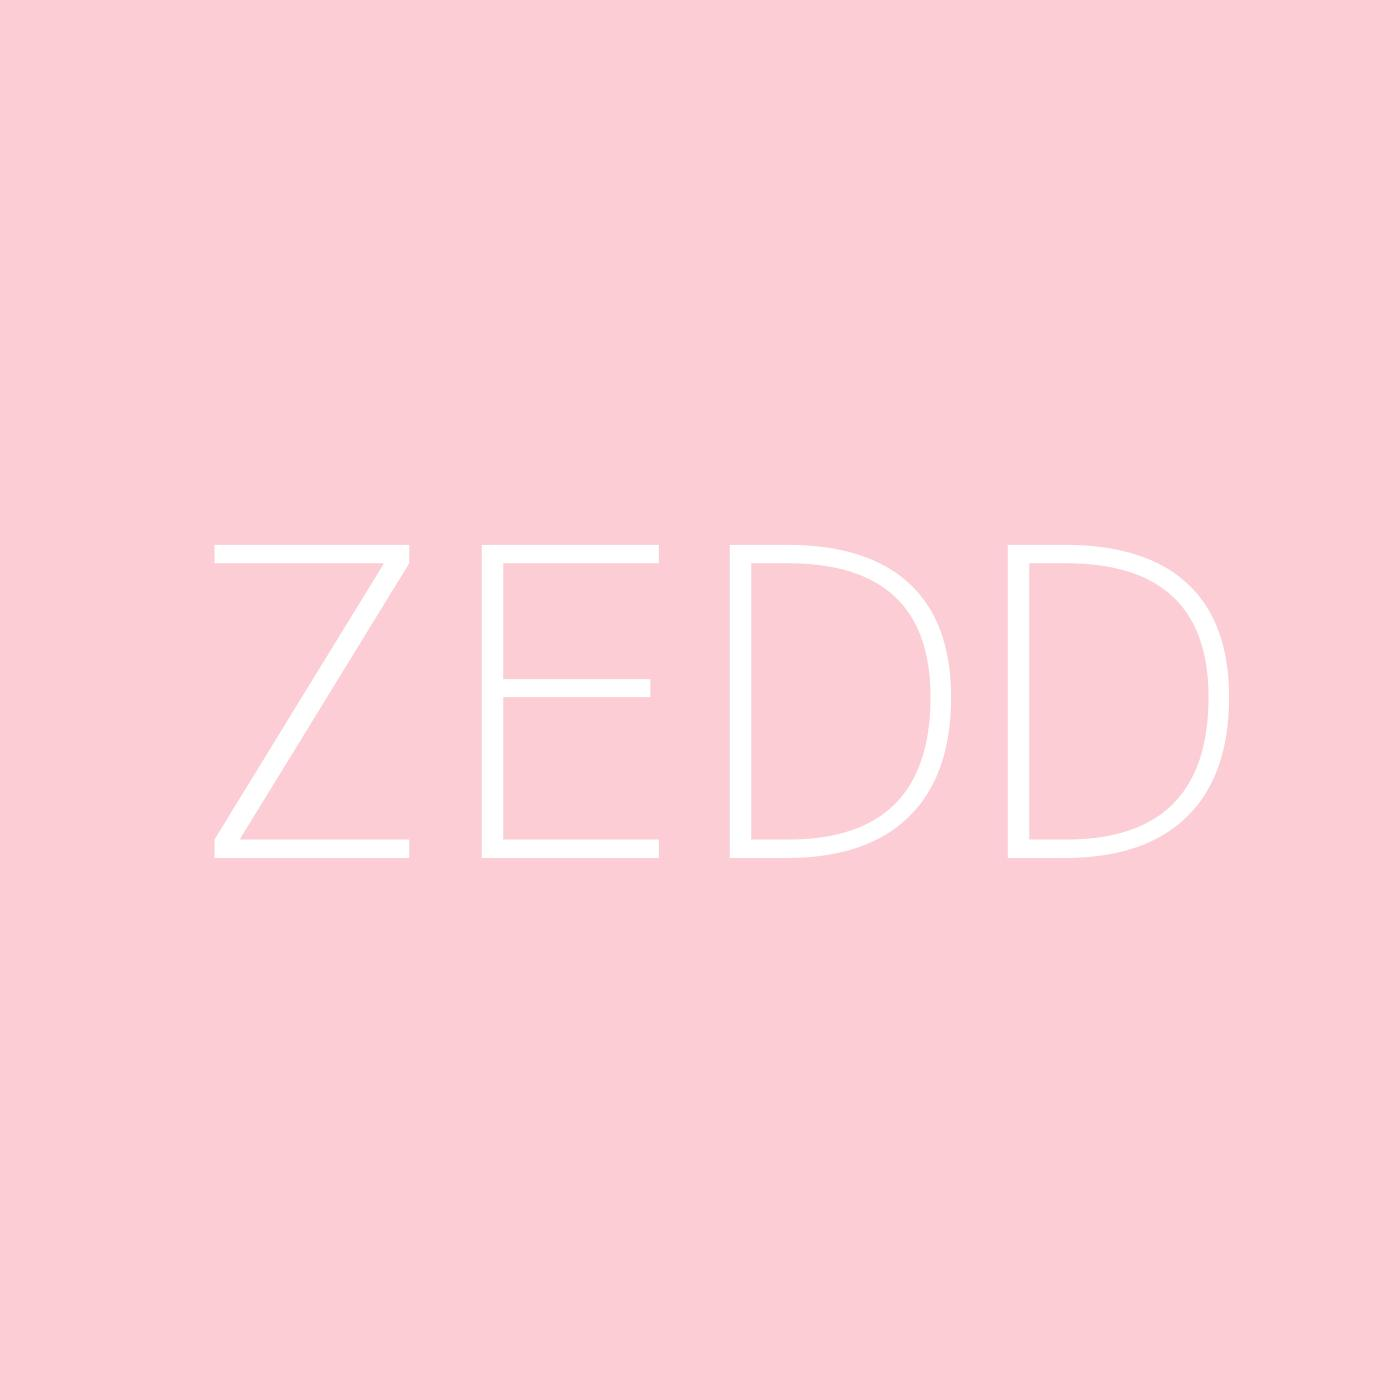 Zedd Playlist Artwork